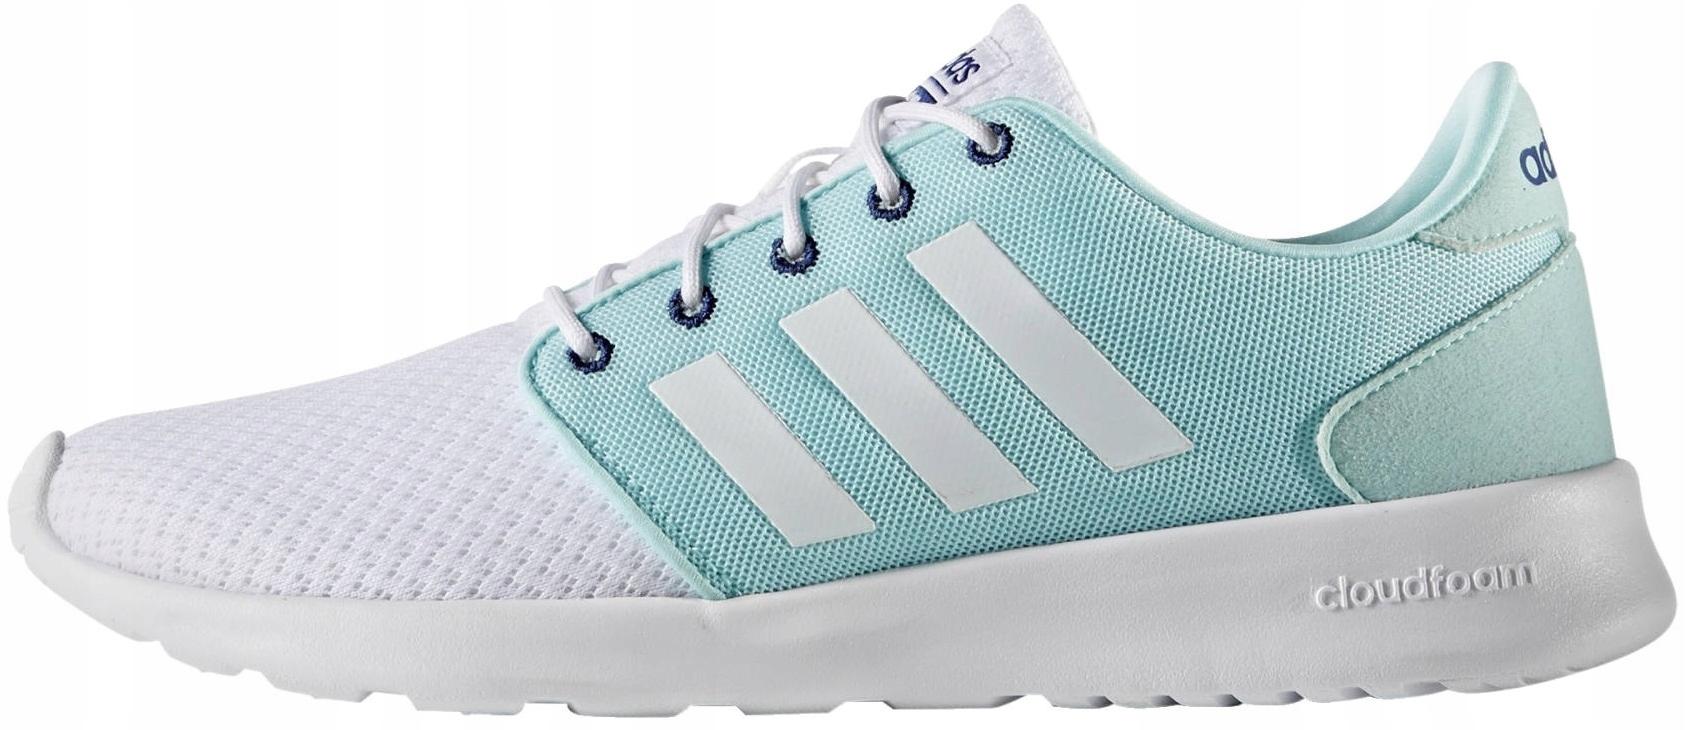 Adidas CLOUDFOAM QT RACER BUTY SPORTOWE 42 23